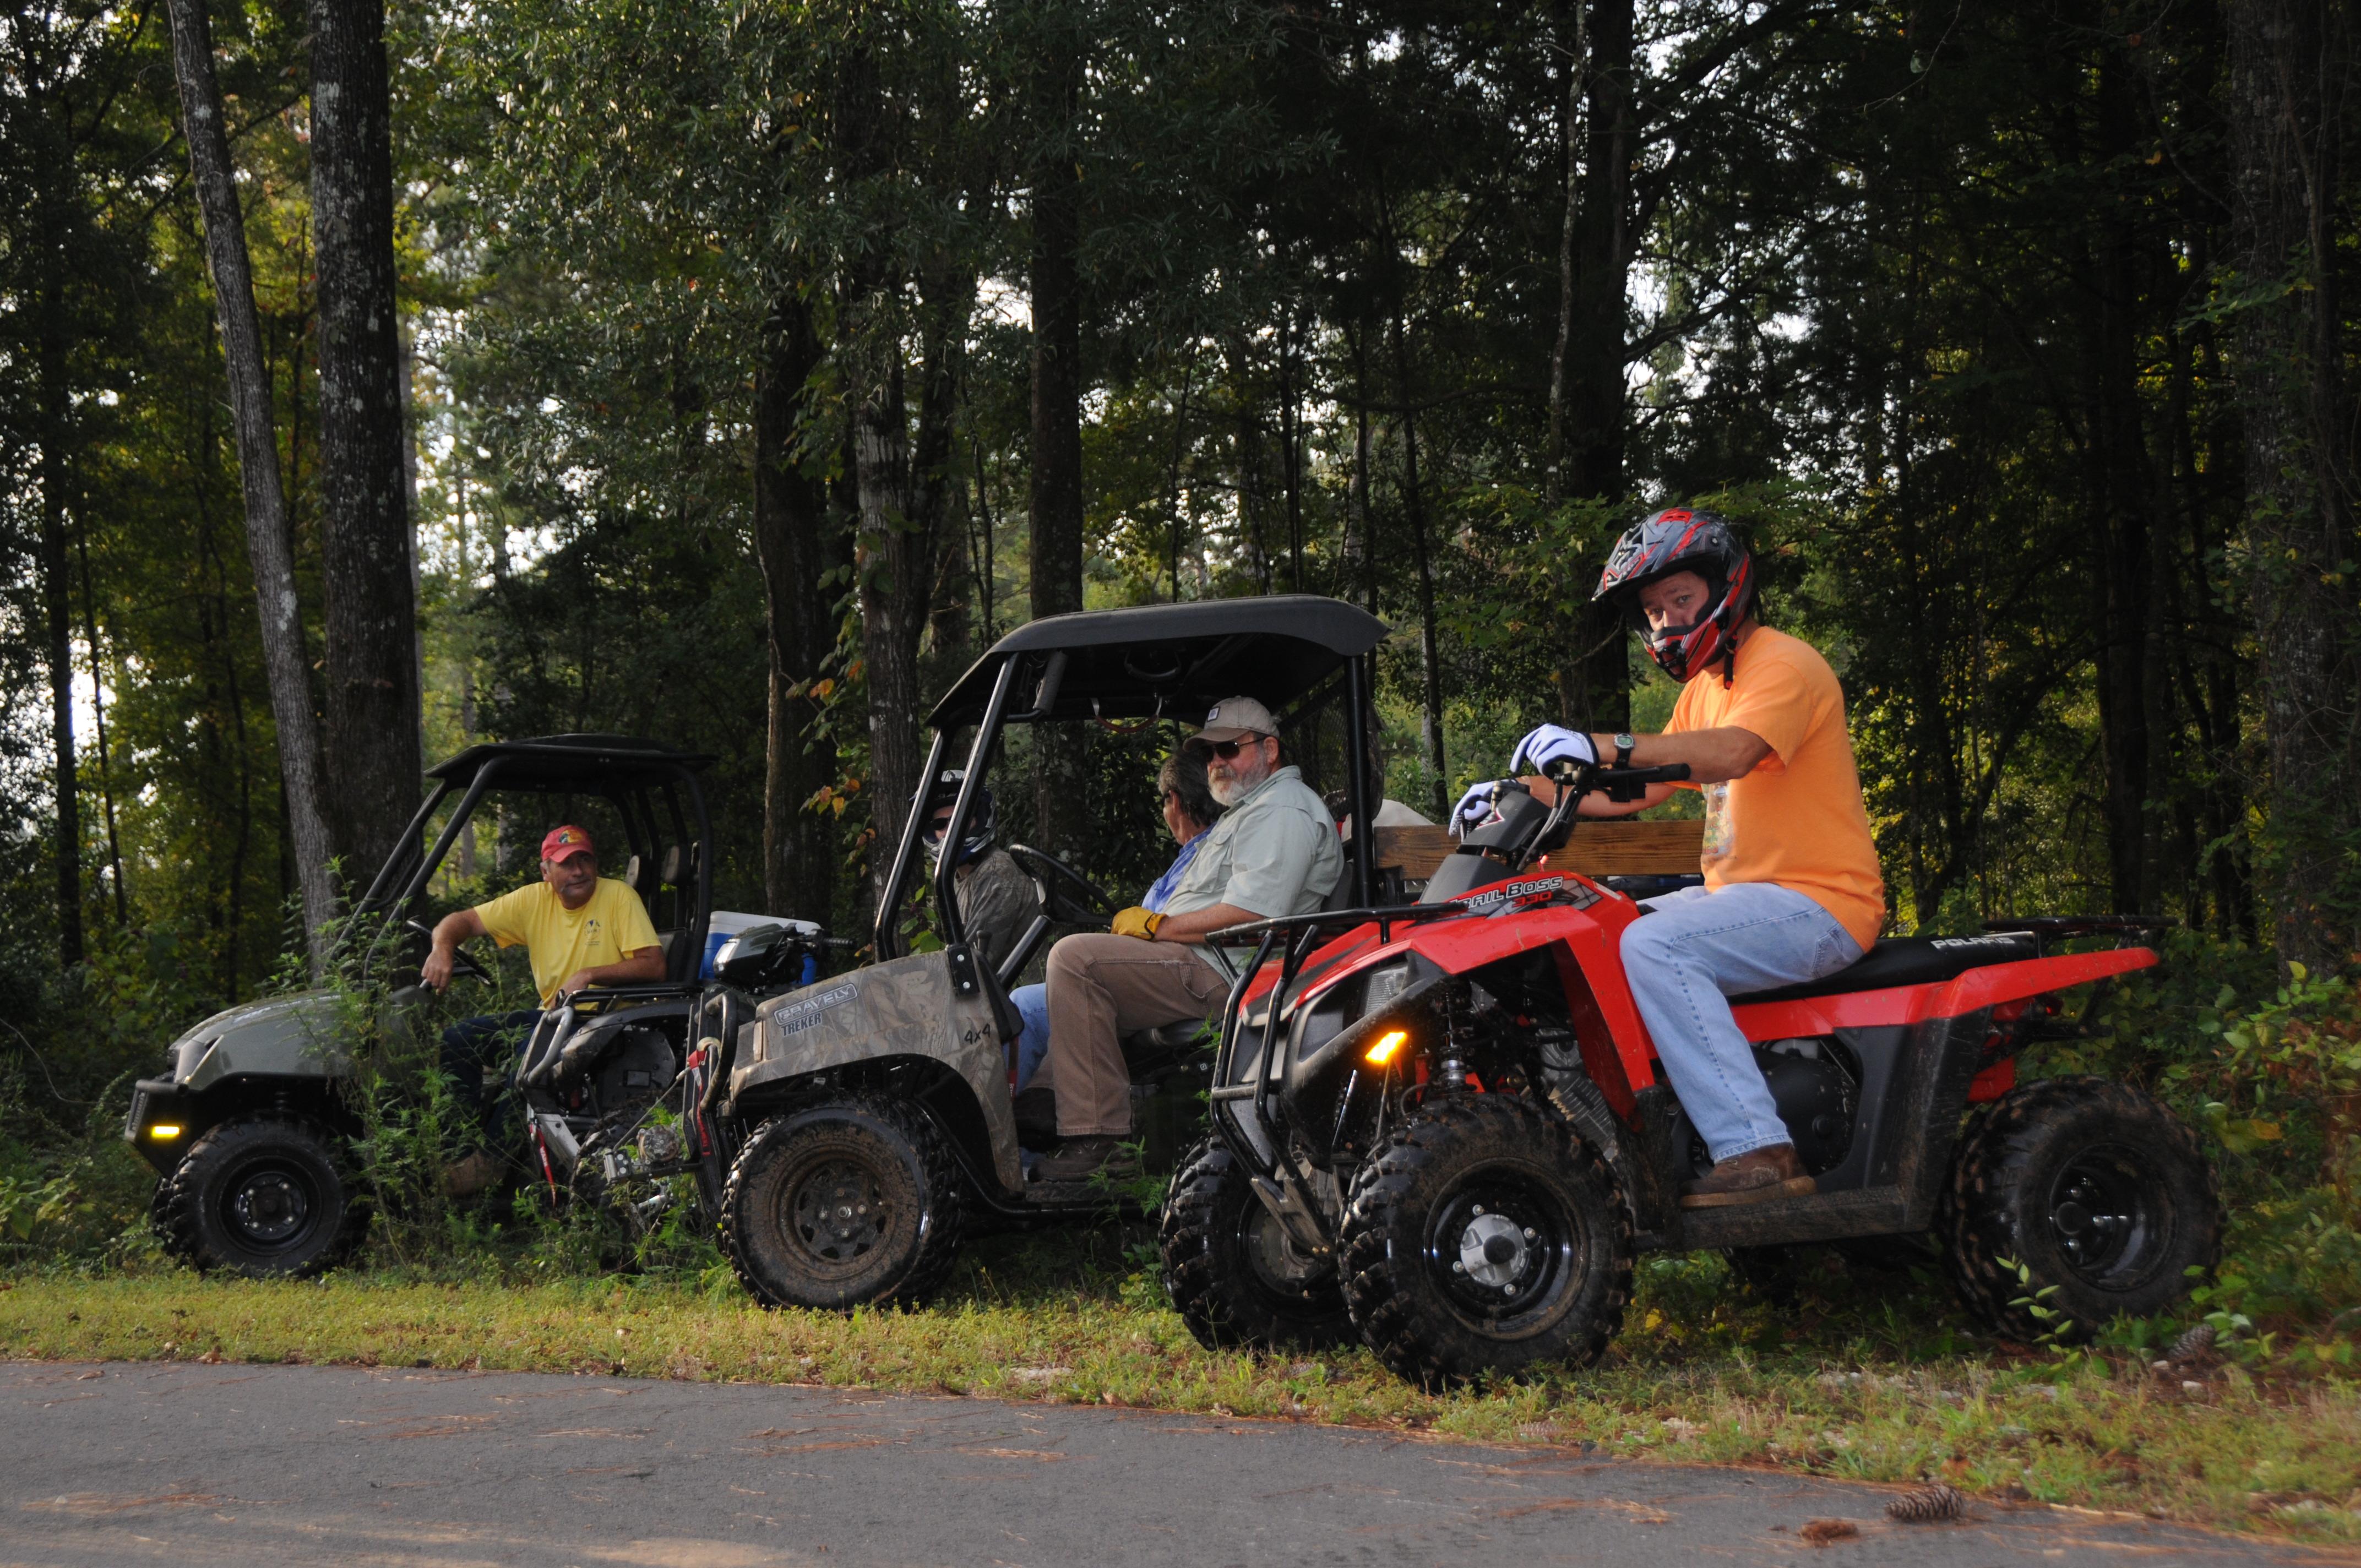 Recreational riders on all-terrain vehicles